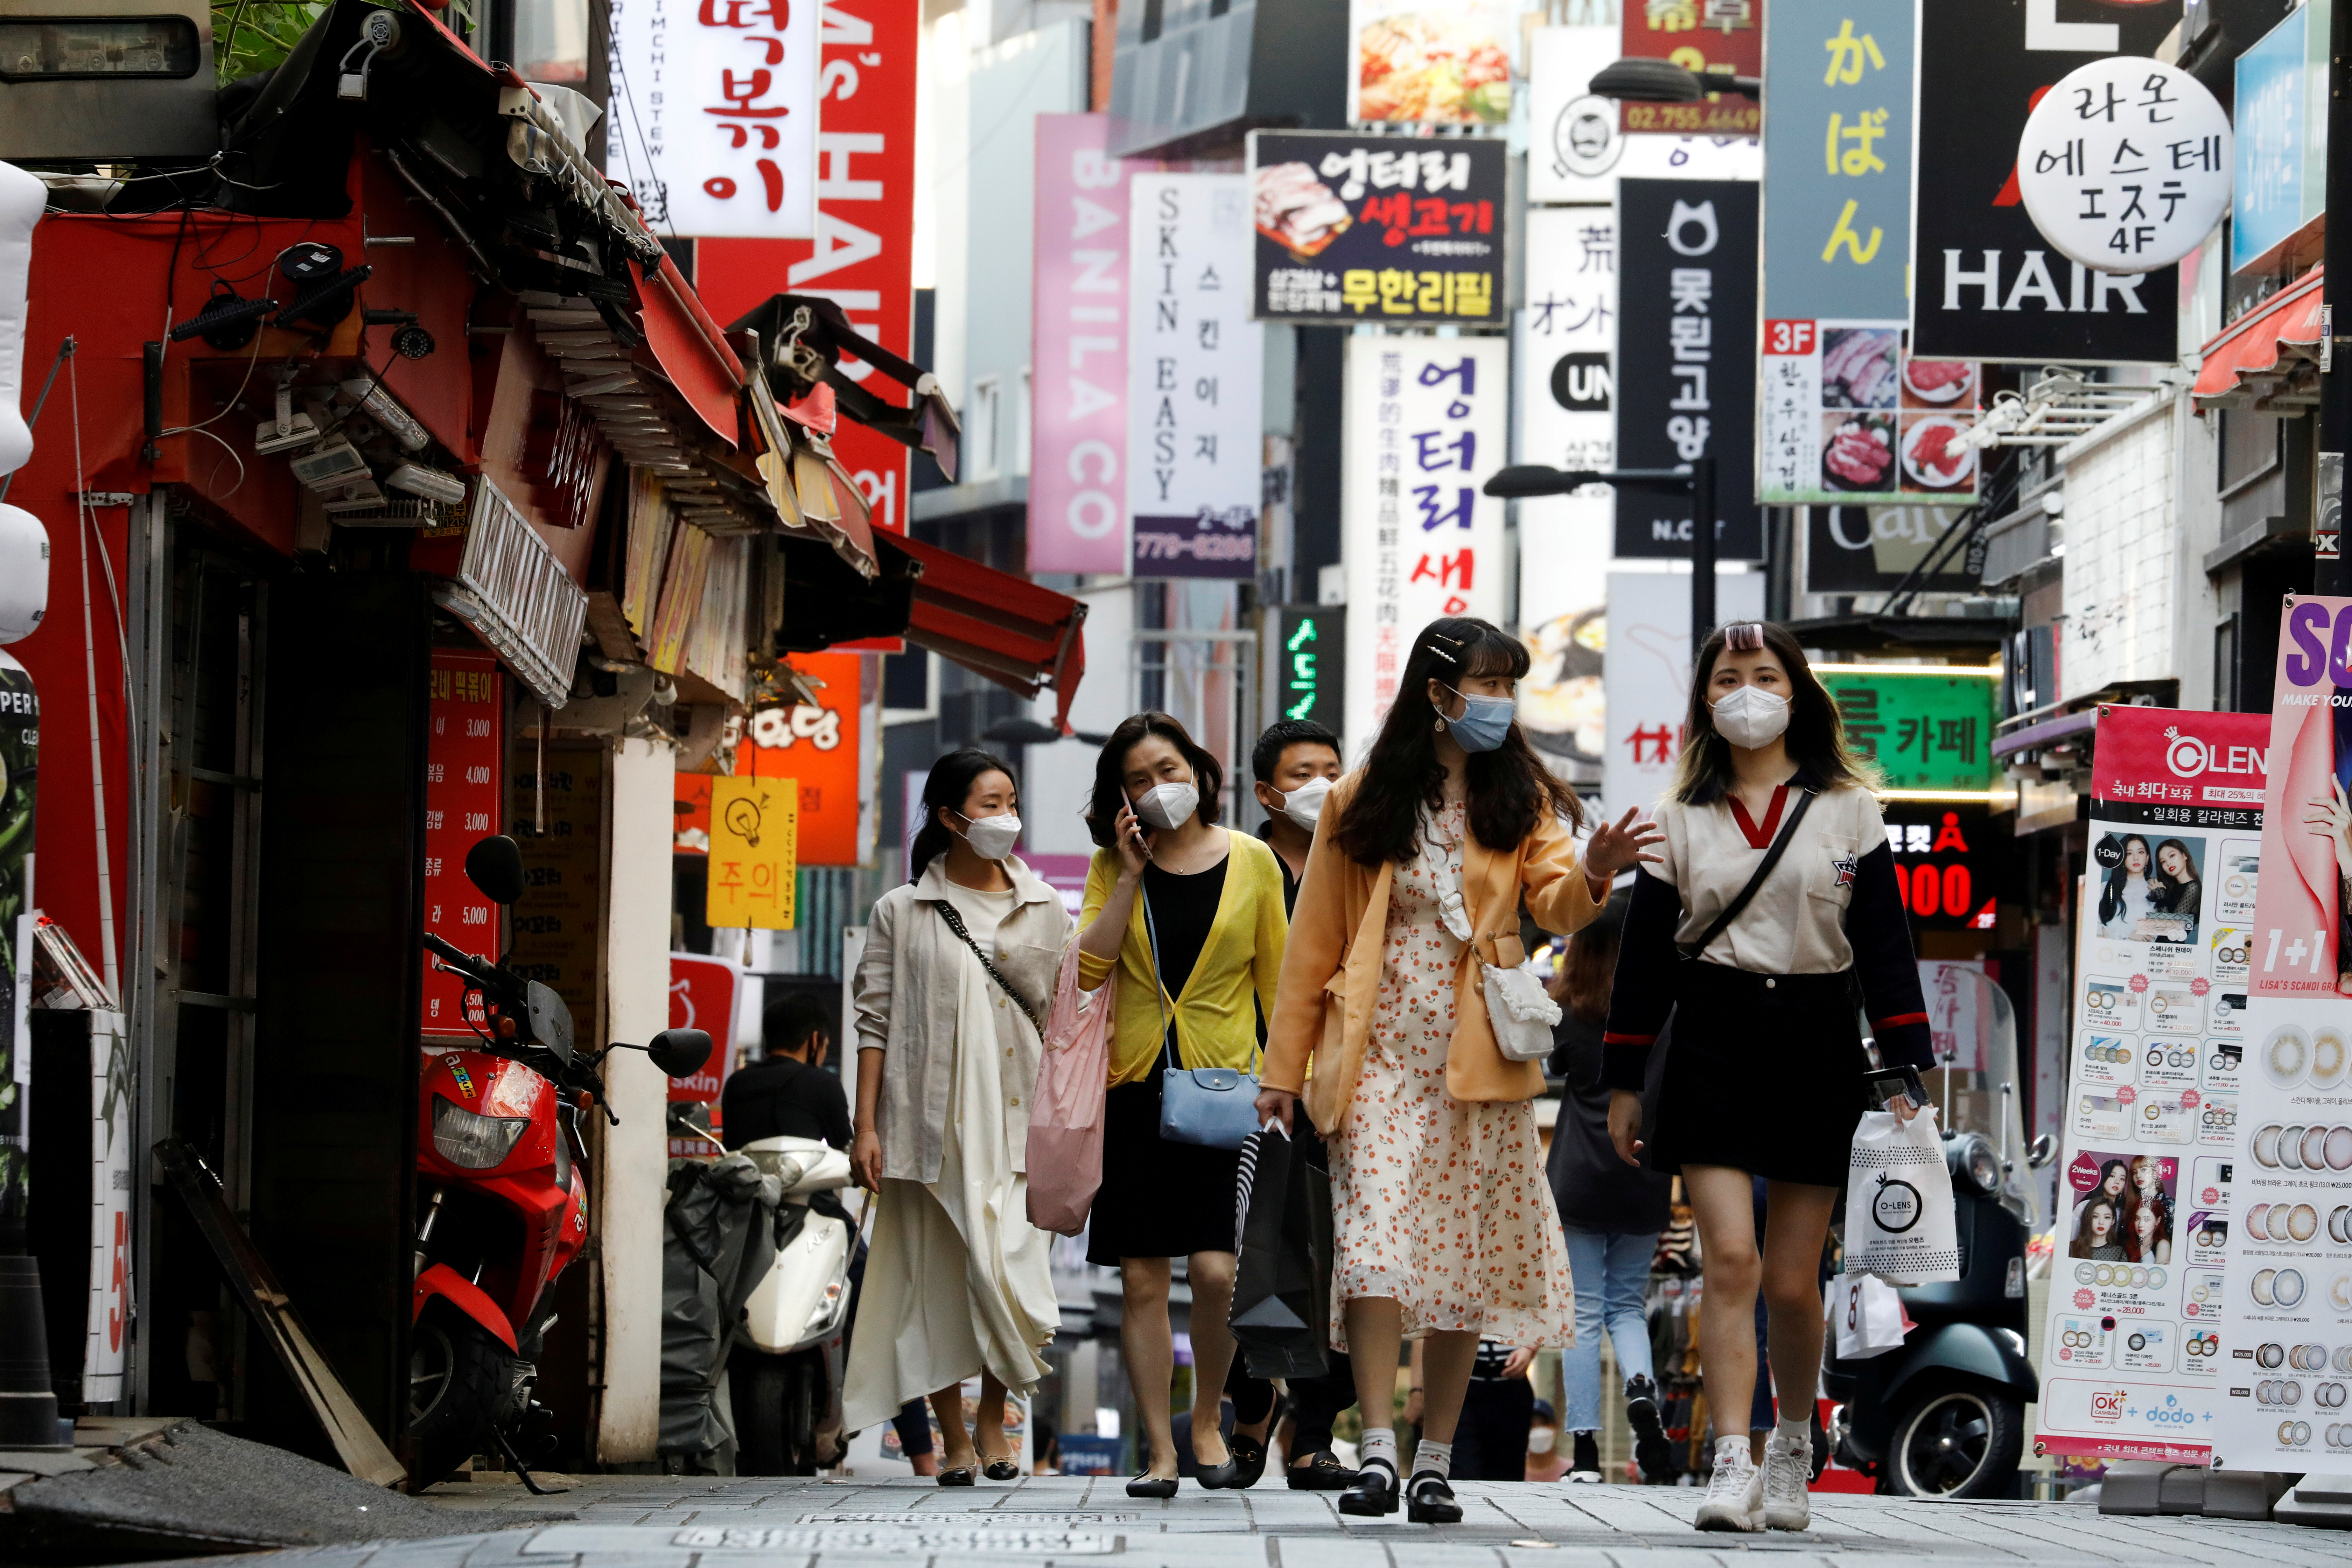 People wearing masks walk at Myeongdong shopping district amid social distancing measures to avoid the spread of the coronavirus disease (COVID-19), in Seoul, South Korea, May 28, 2020.   REUTERS/Kim Hong-Ji